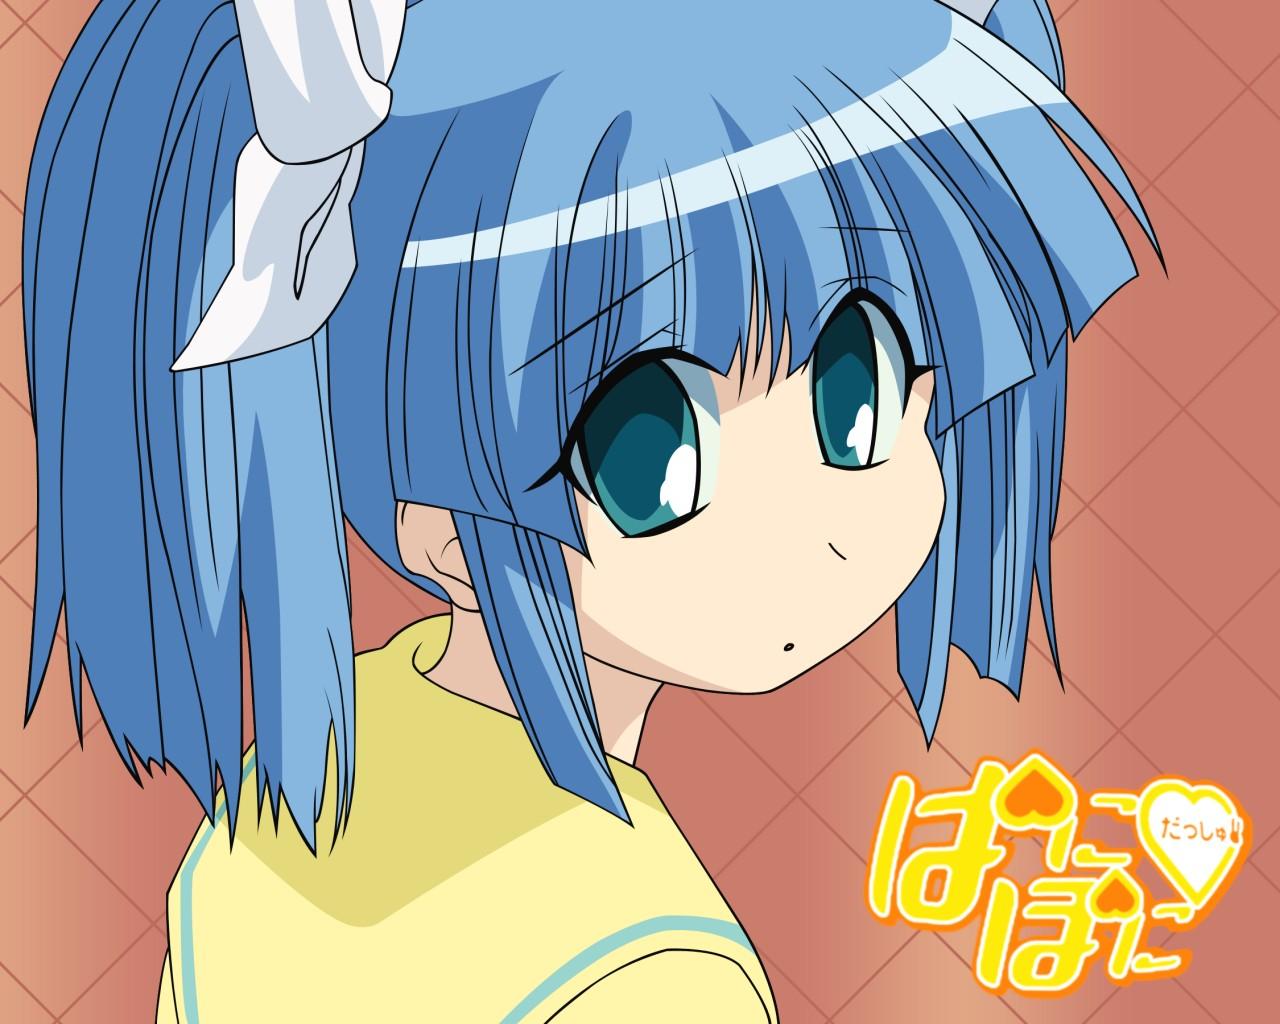 pani_poni_dash suzuki_sayaka